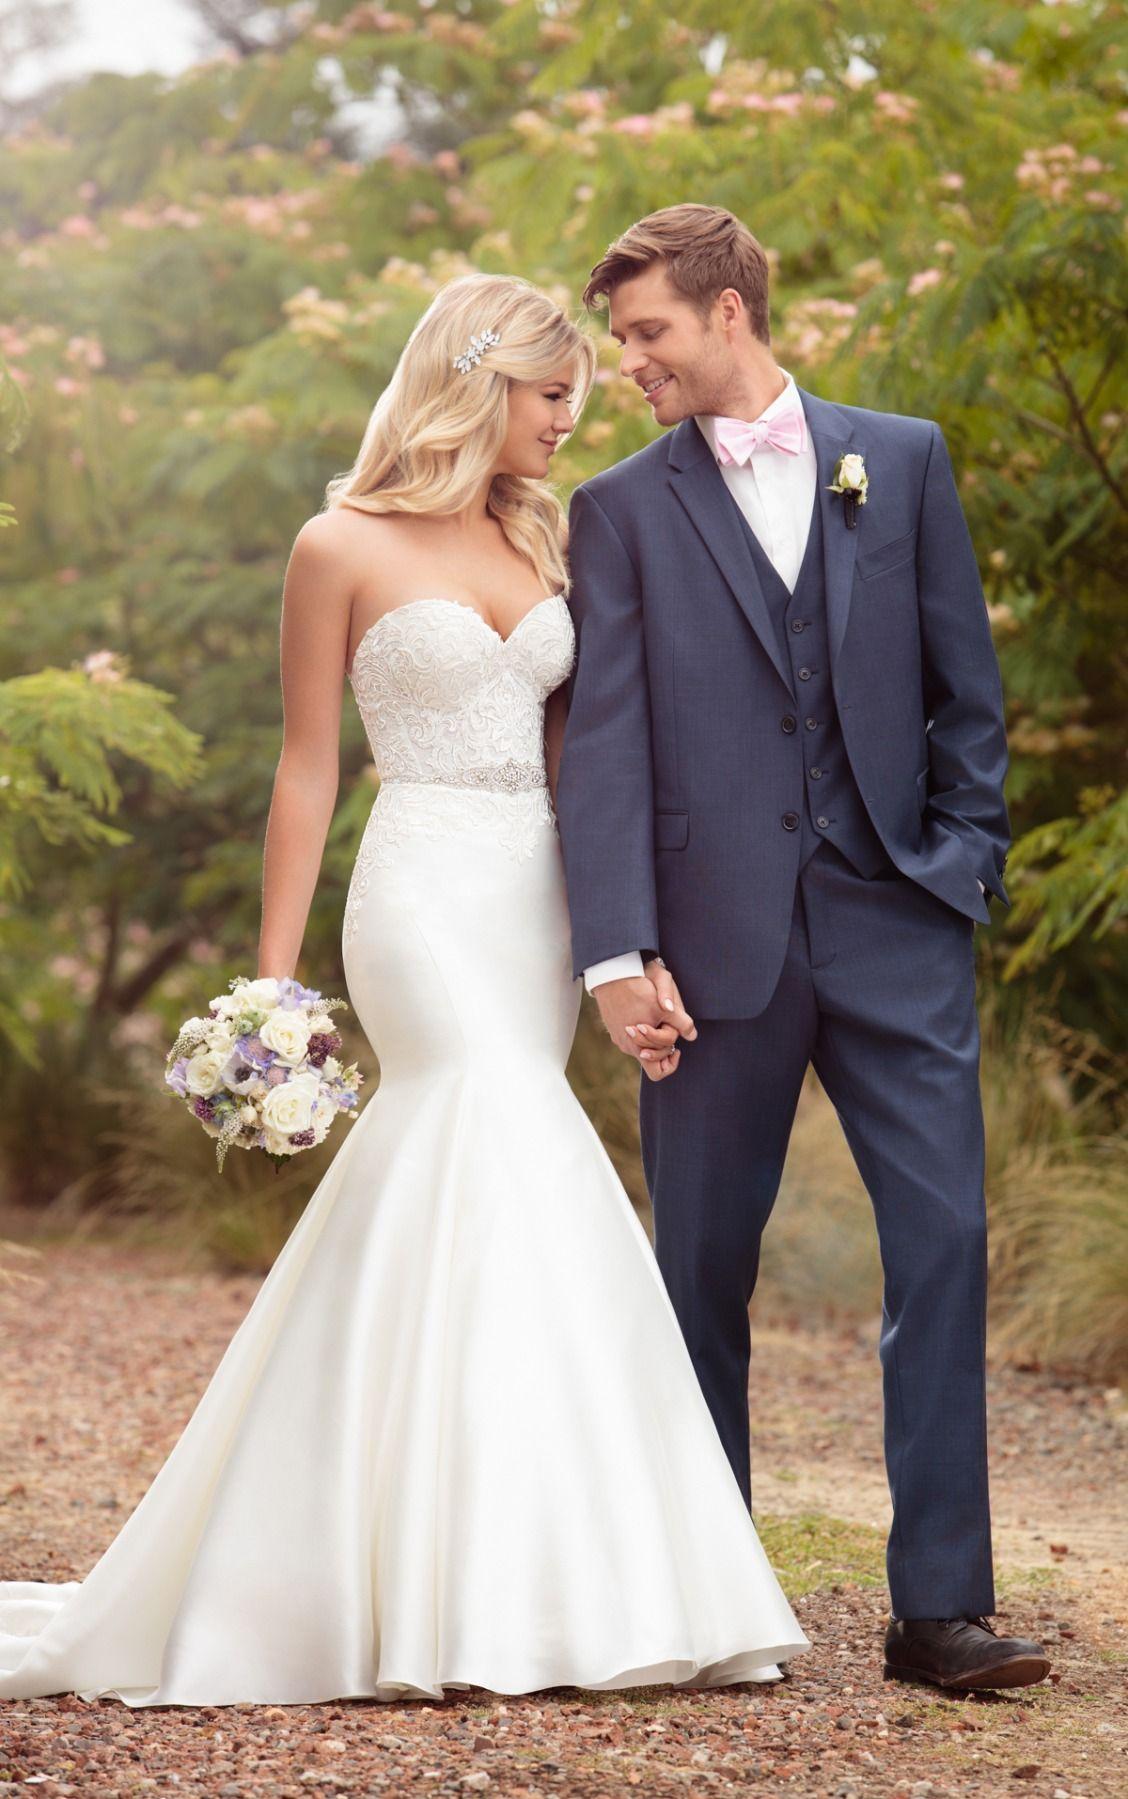 Classic Trumpet Wedding Dress With Sheer Embroidered Bodice Essense Of Australia Essense Of Australia Wedding Dresses Mermaid Wedding Dress Wedding Dresses [ 1799 x 1128 Pixel ]